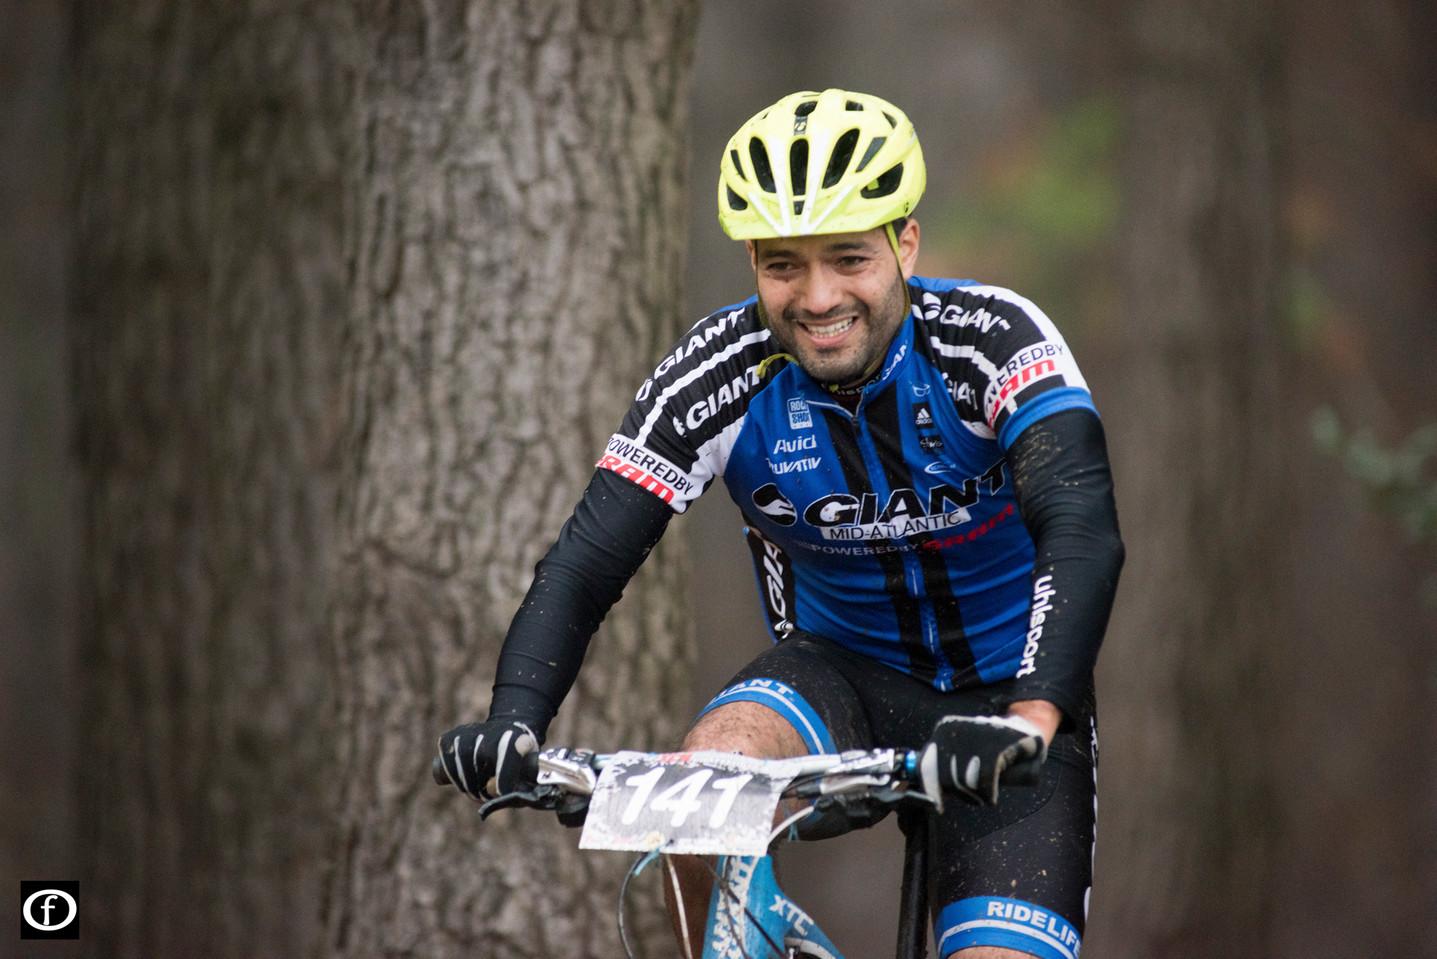 2015-05-17-Ciclismo Enduro-53.jpg